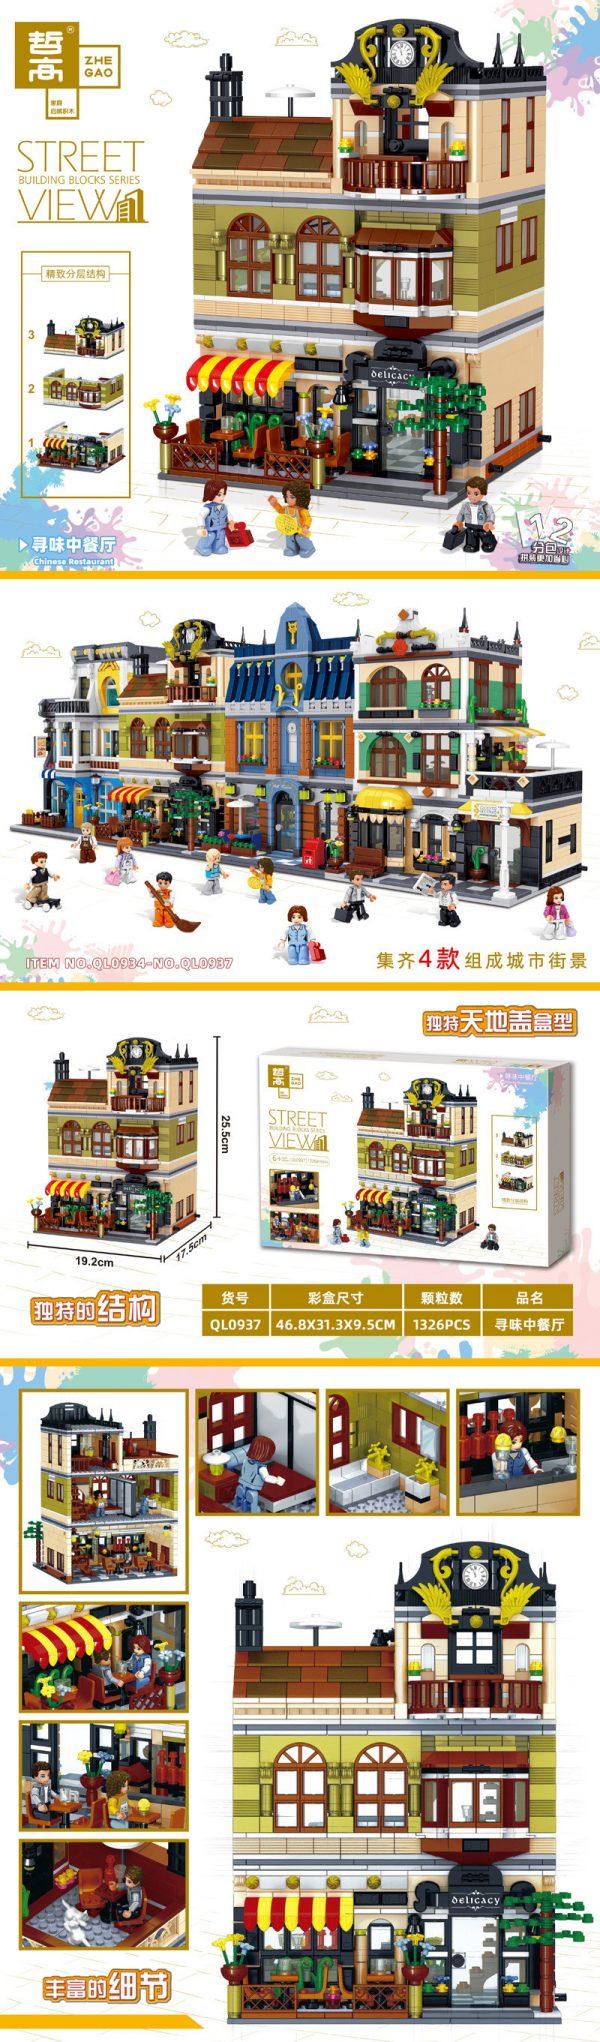 ZHEGAO QL0937 Street View: Find Chinese Restaurant 1